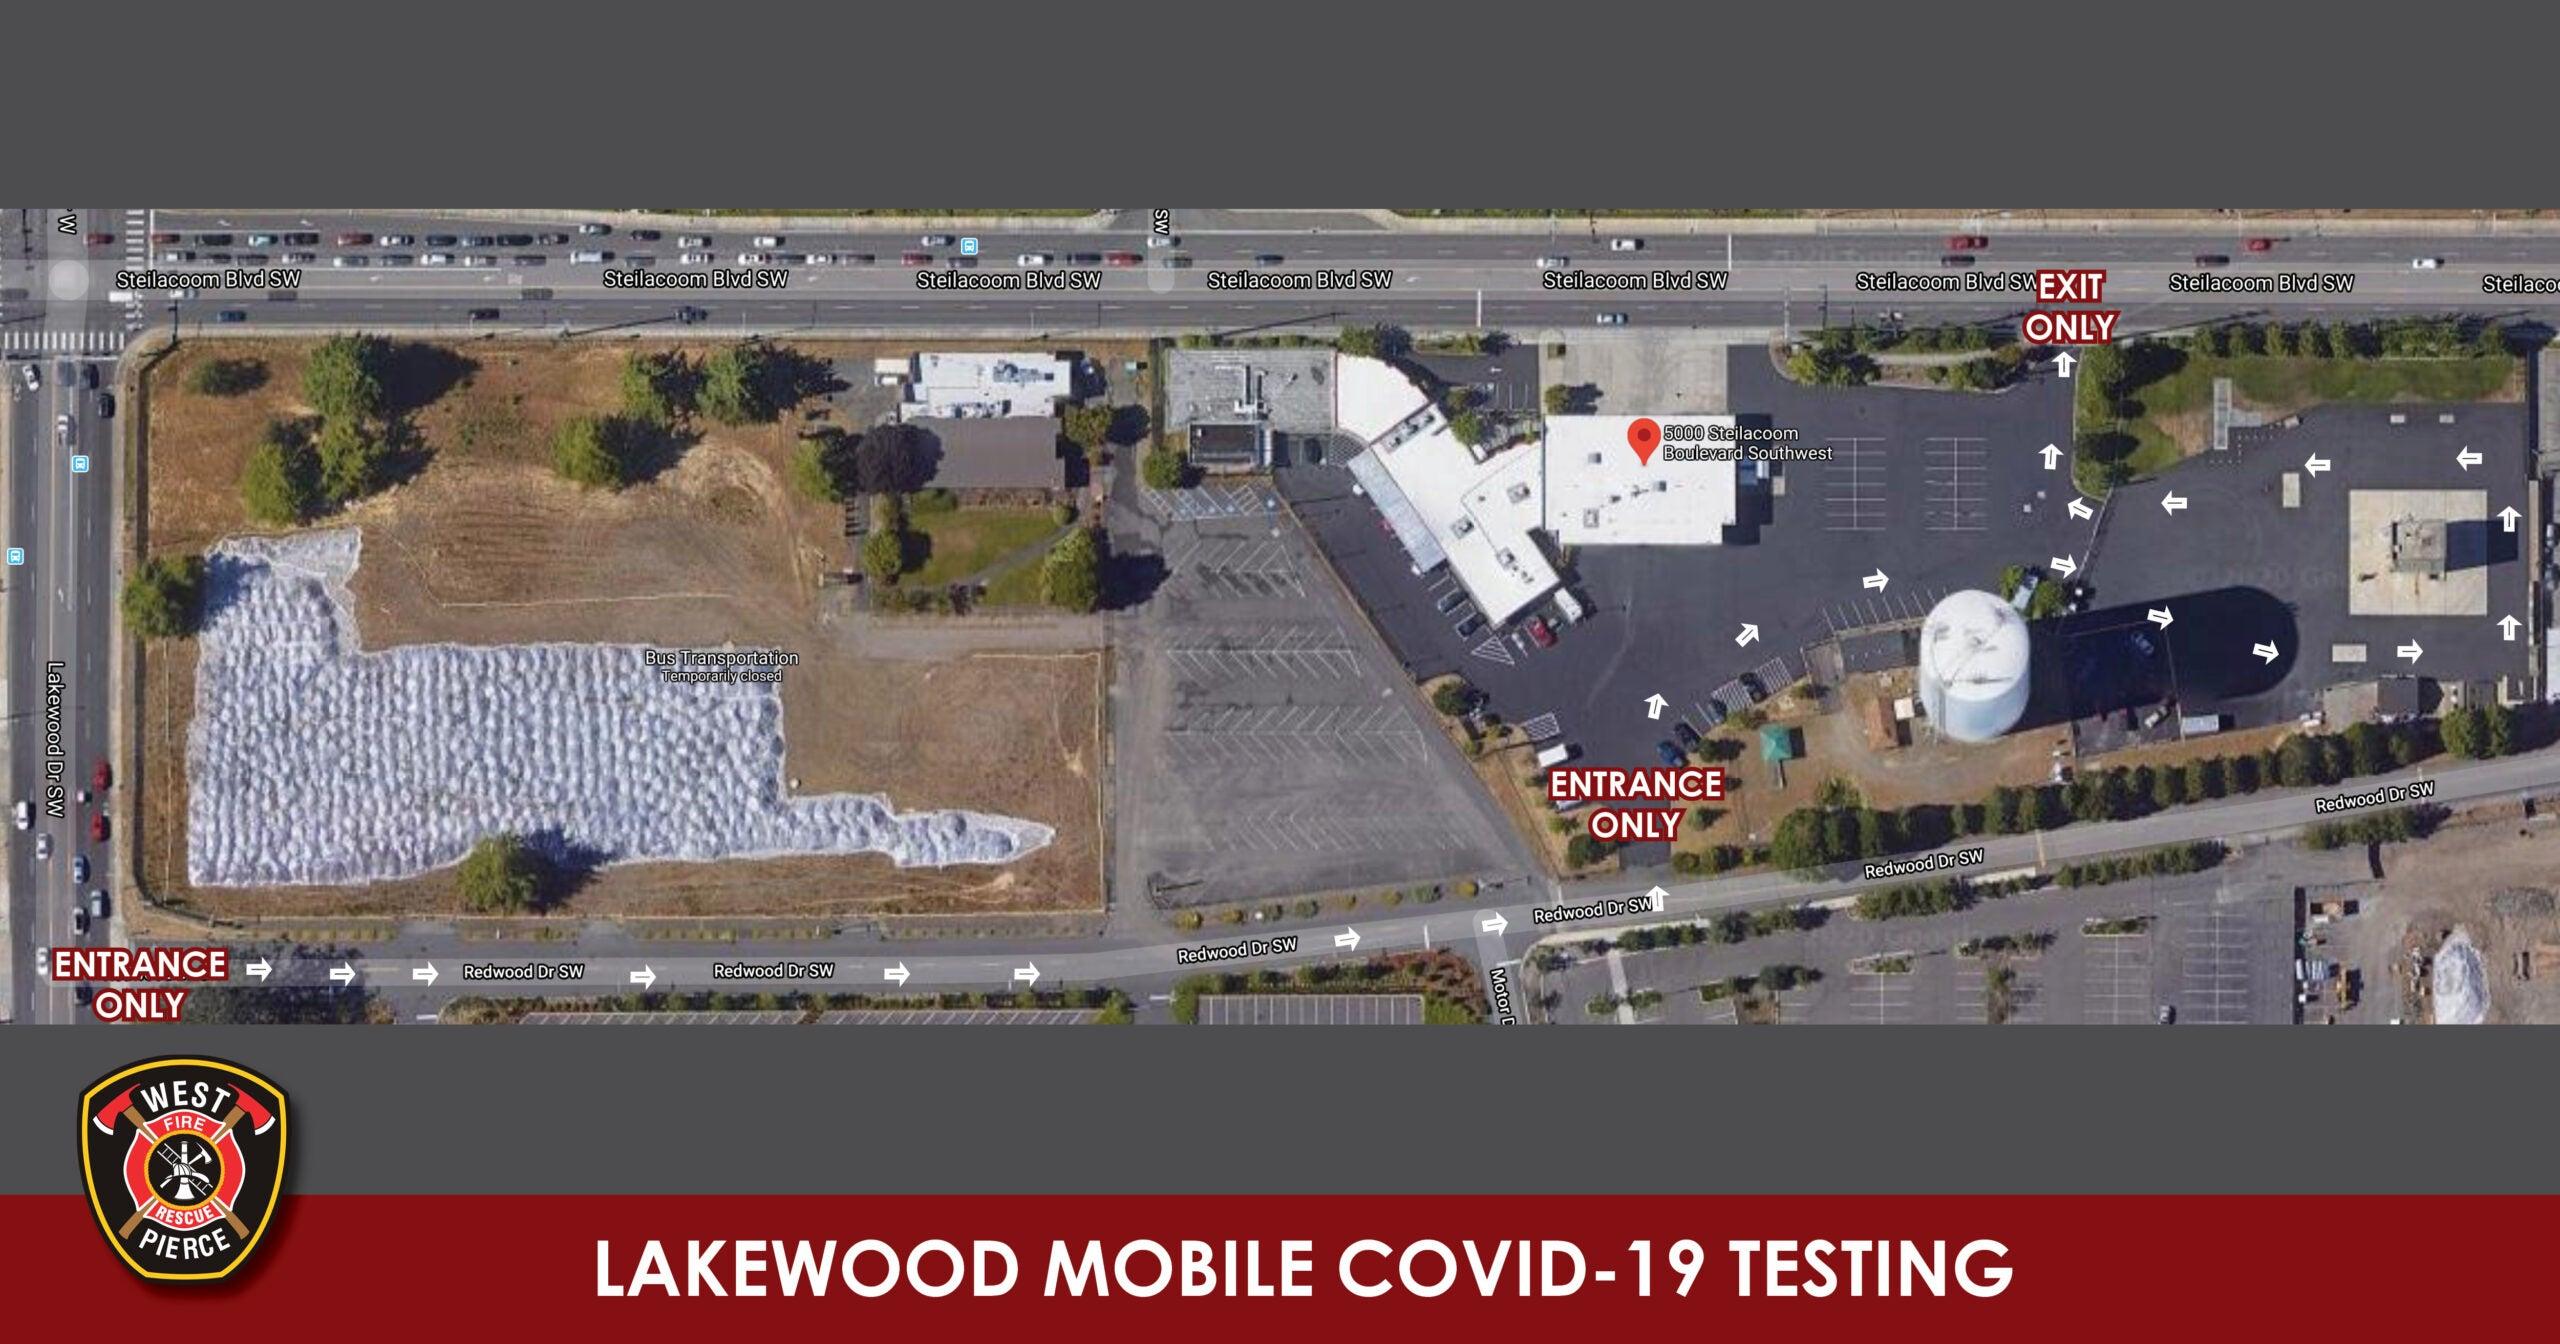 Mobile COVID testing